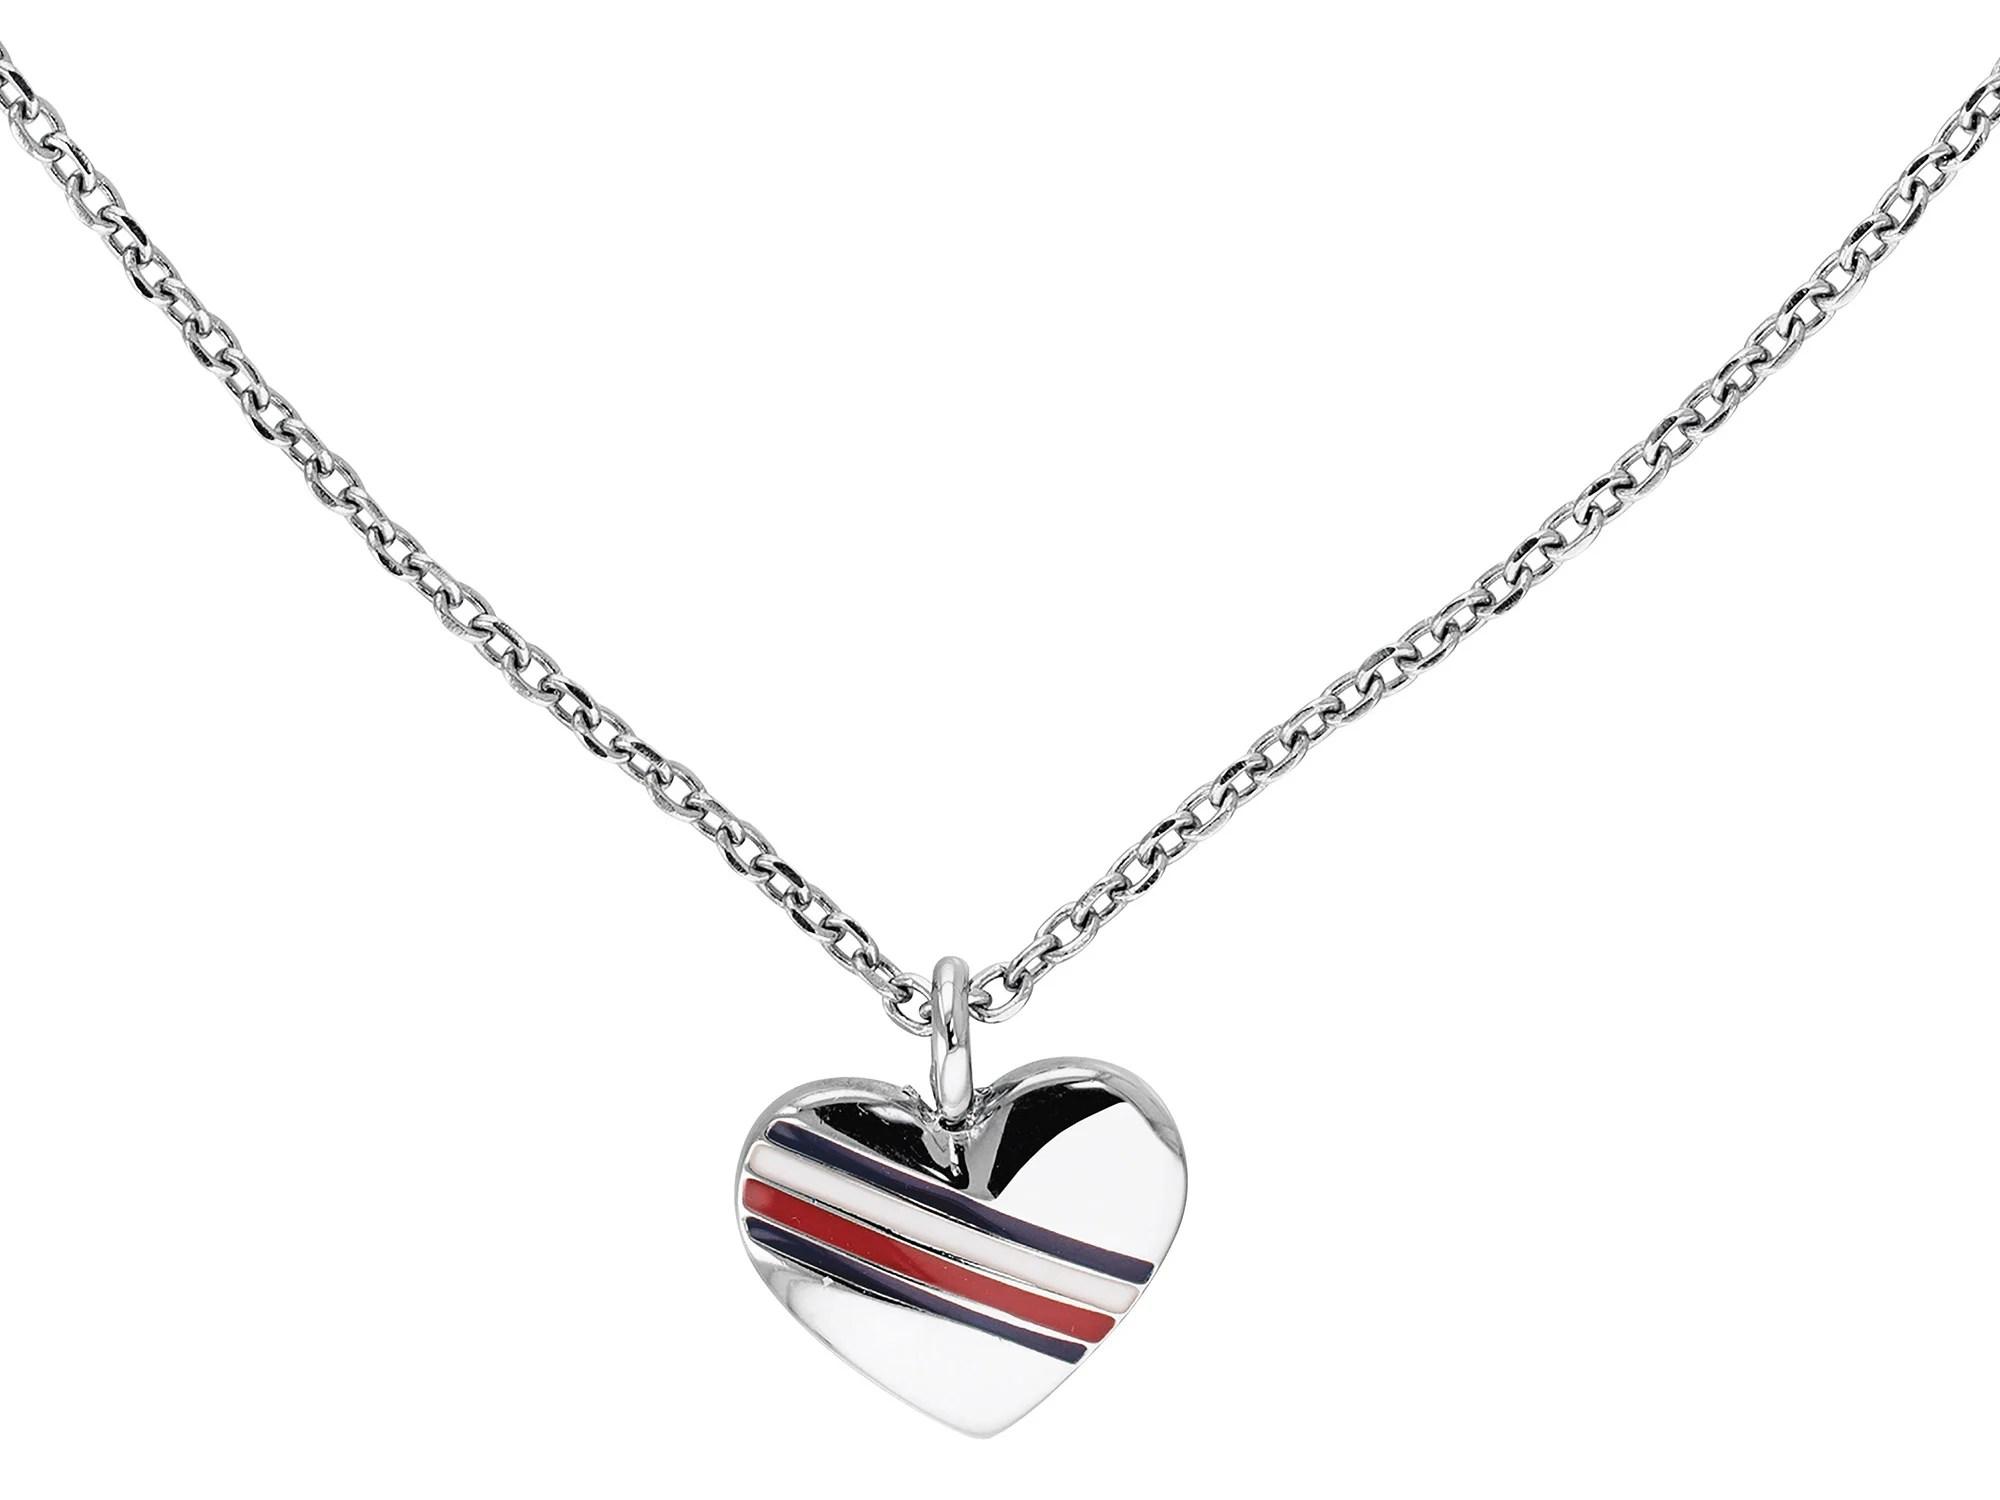 Tommy Hilfiger Necklaces At Low Prices Uhrcenter Shop